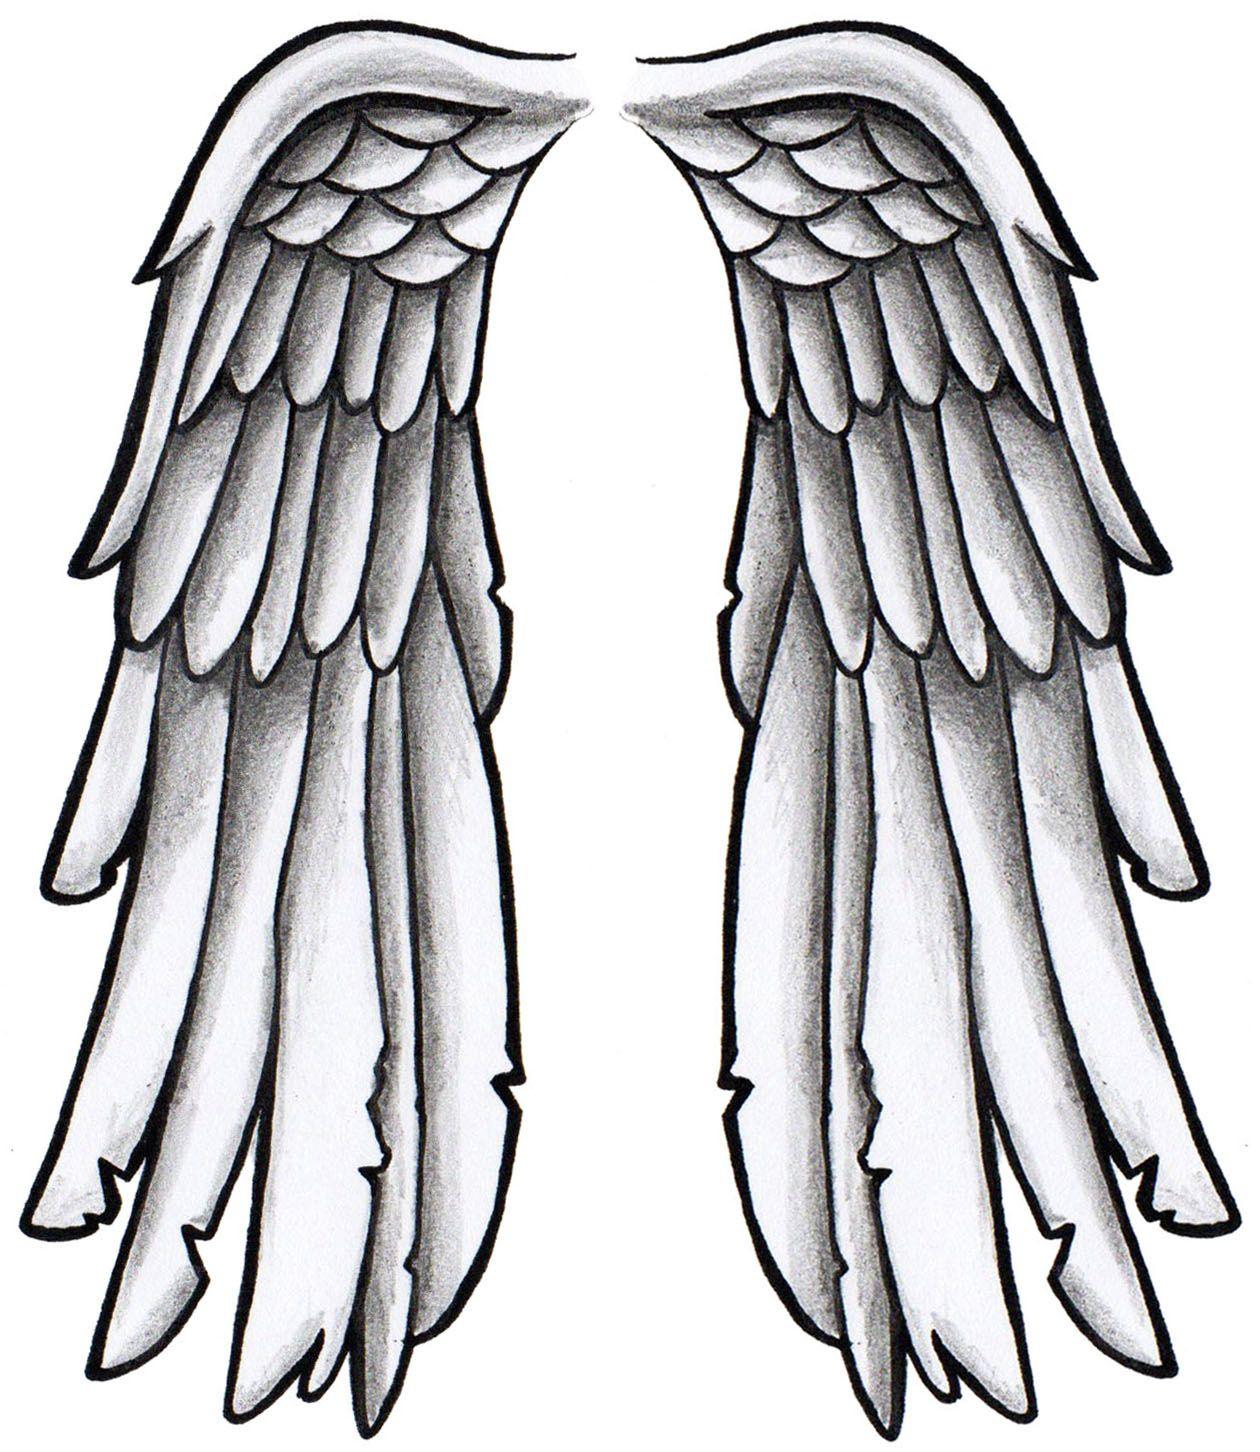 Wing tattoo design - Black And Grey Wing Tattoo Design Tattoo Tattoodesign Drawing Wings Blackandgrey